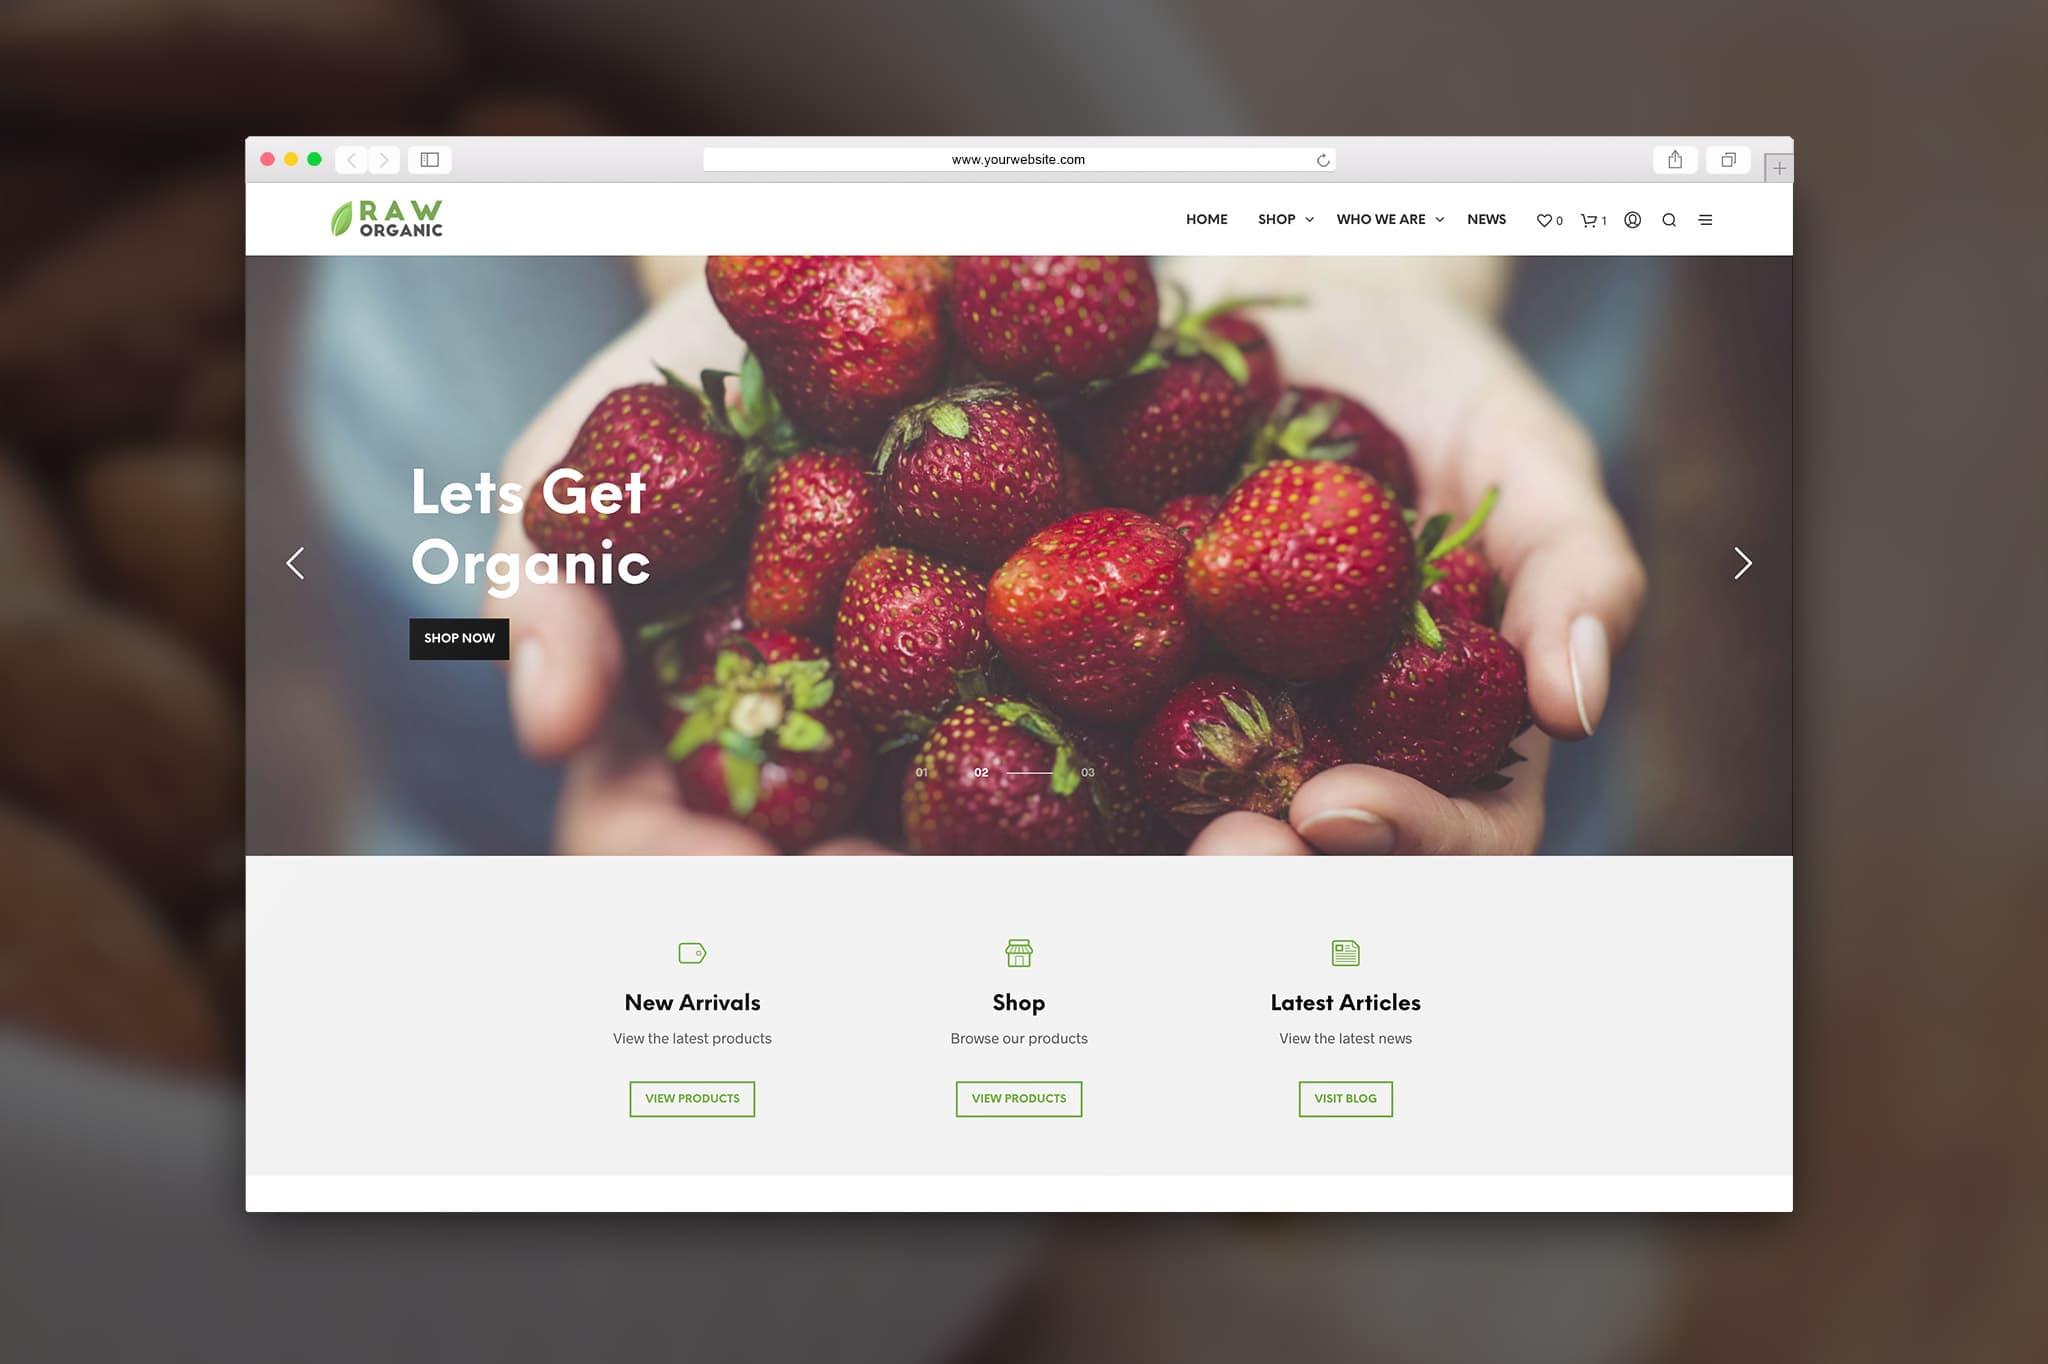 Raw Organic UK